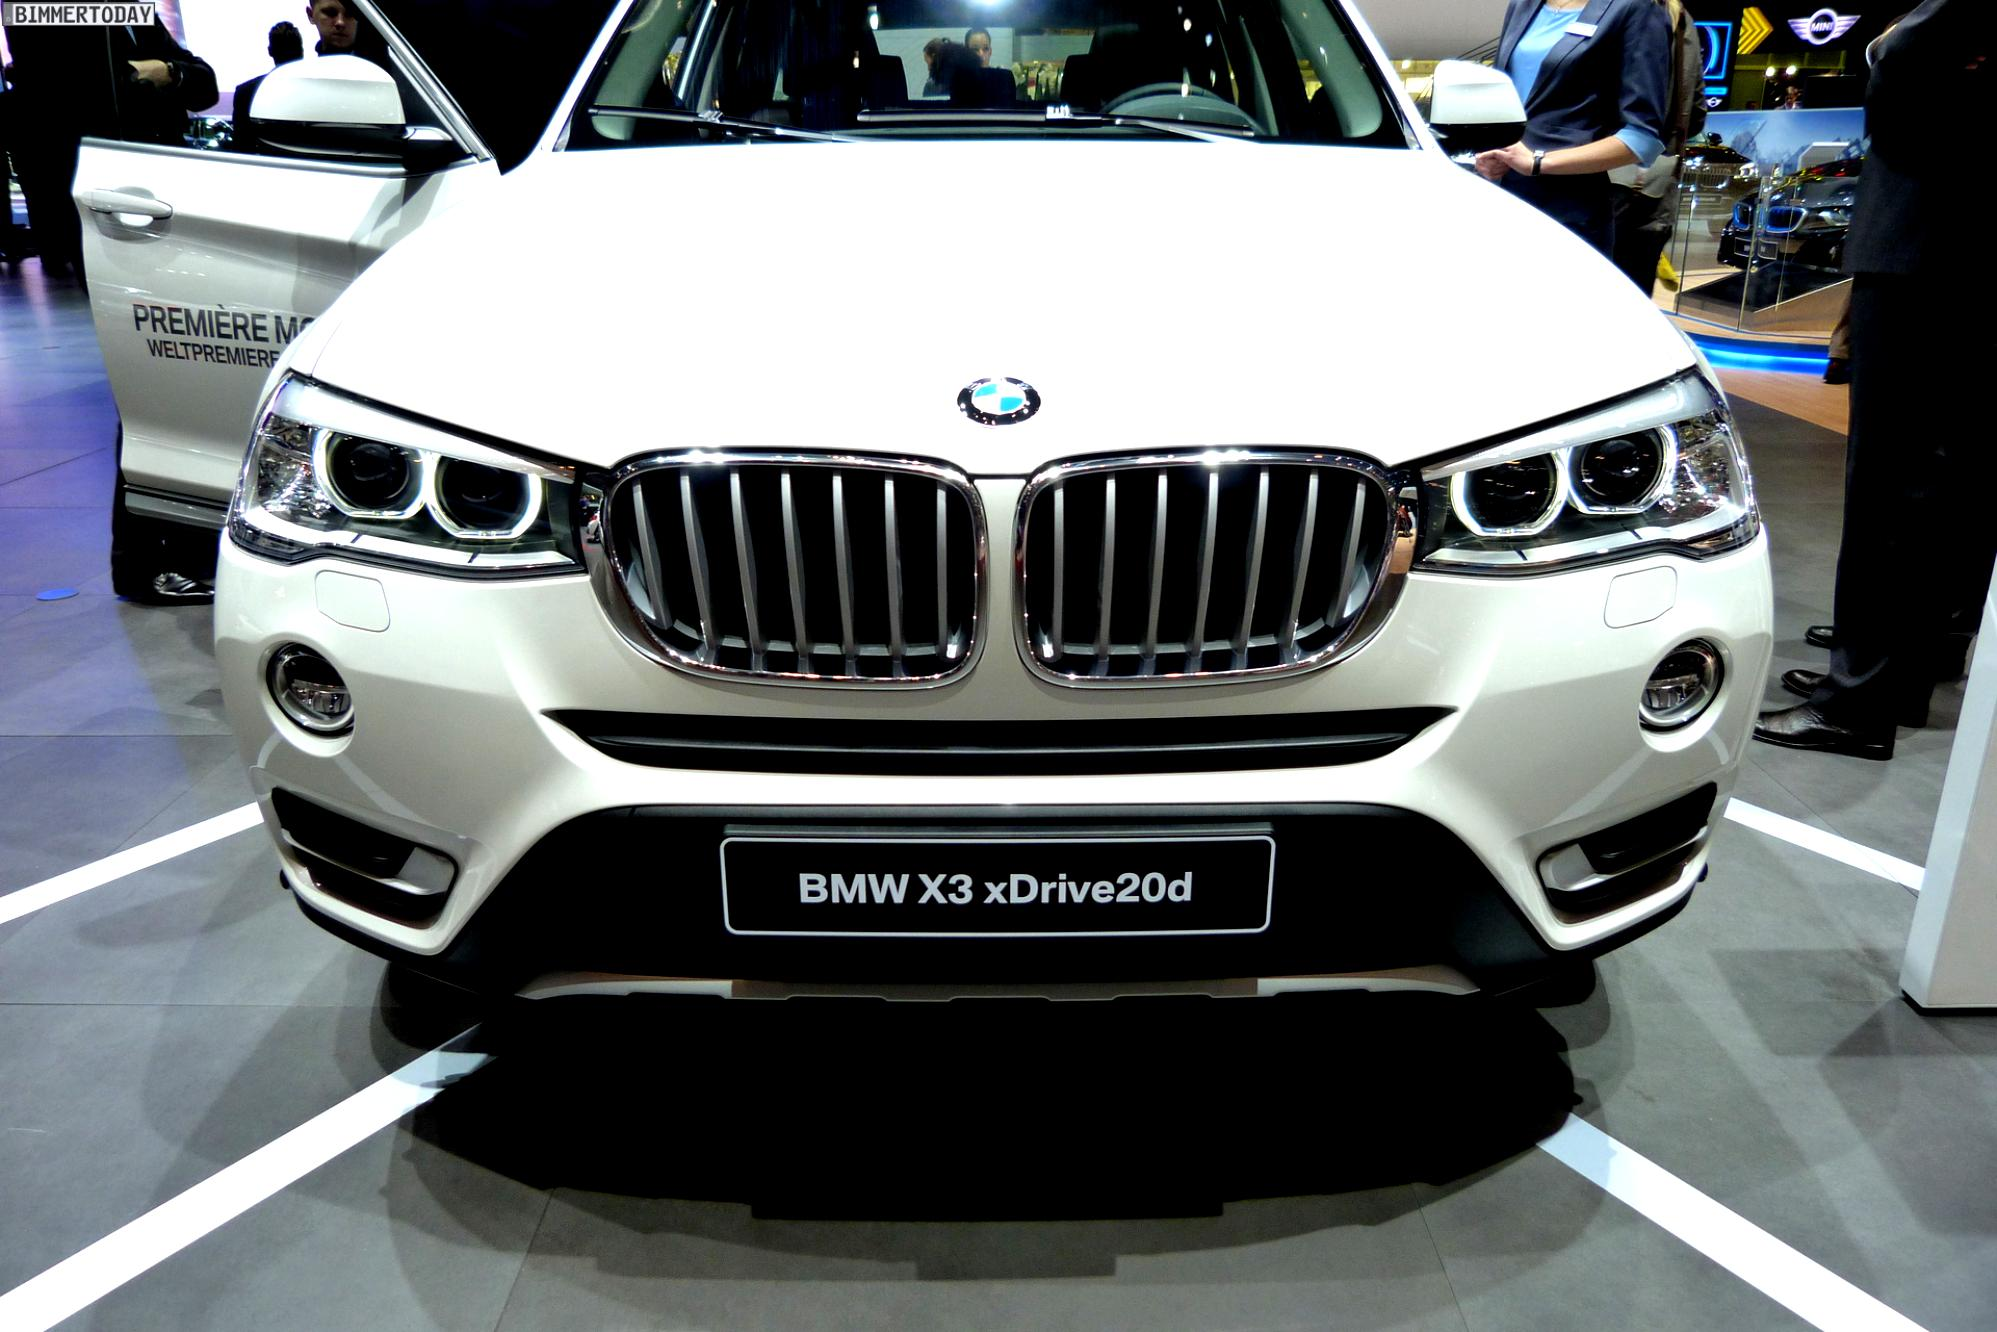 BMW X3 F25 2014 on MotoImg